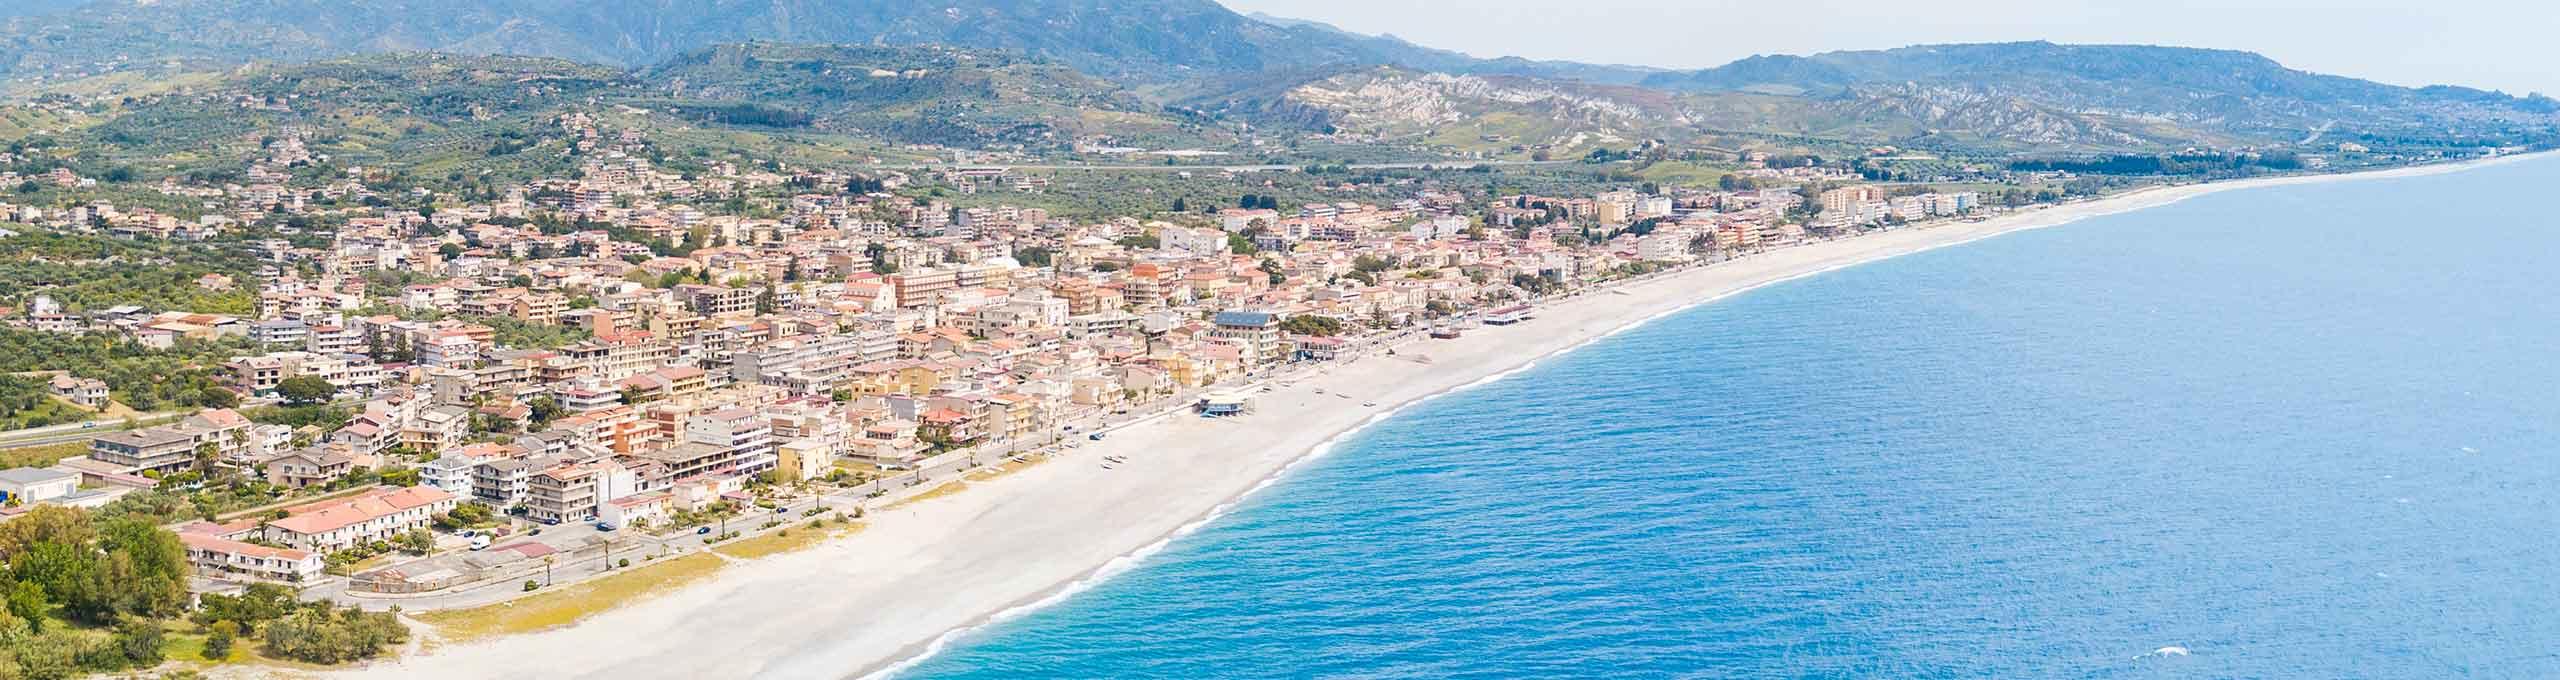 Marina di Gioiosa, Riviera dei Gelsomini